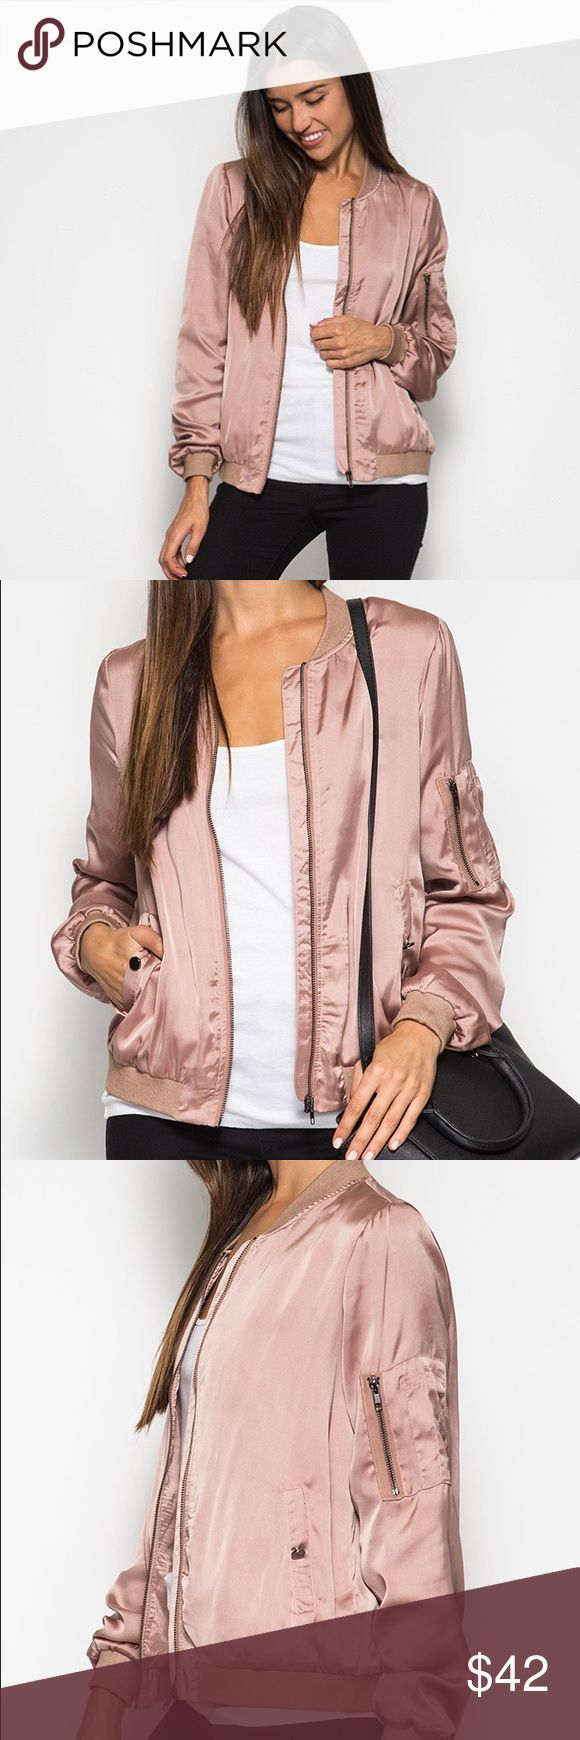 Rose gold bomber jacket Satin looking bomber jacket with side pocket in rose gold color Jackets & Coats